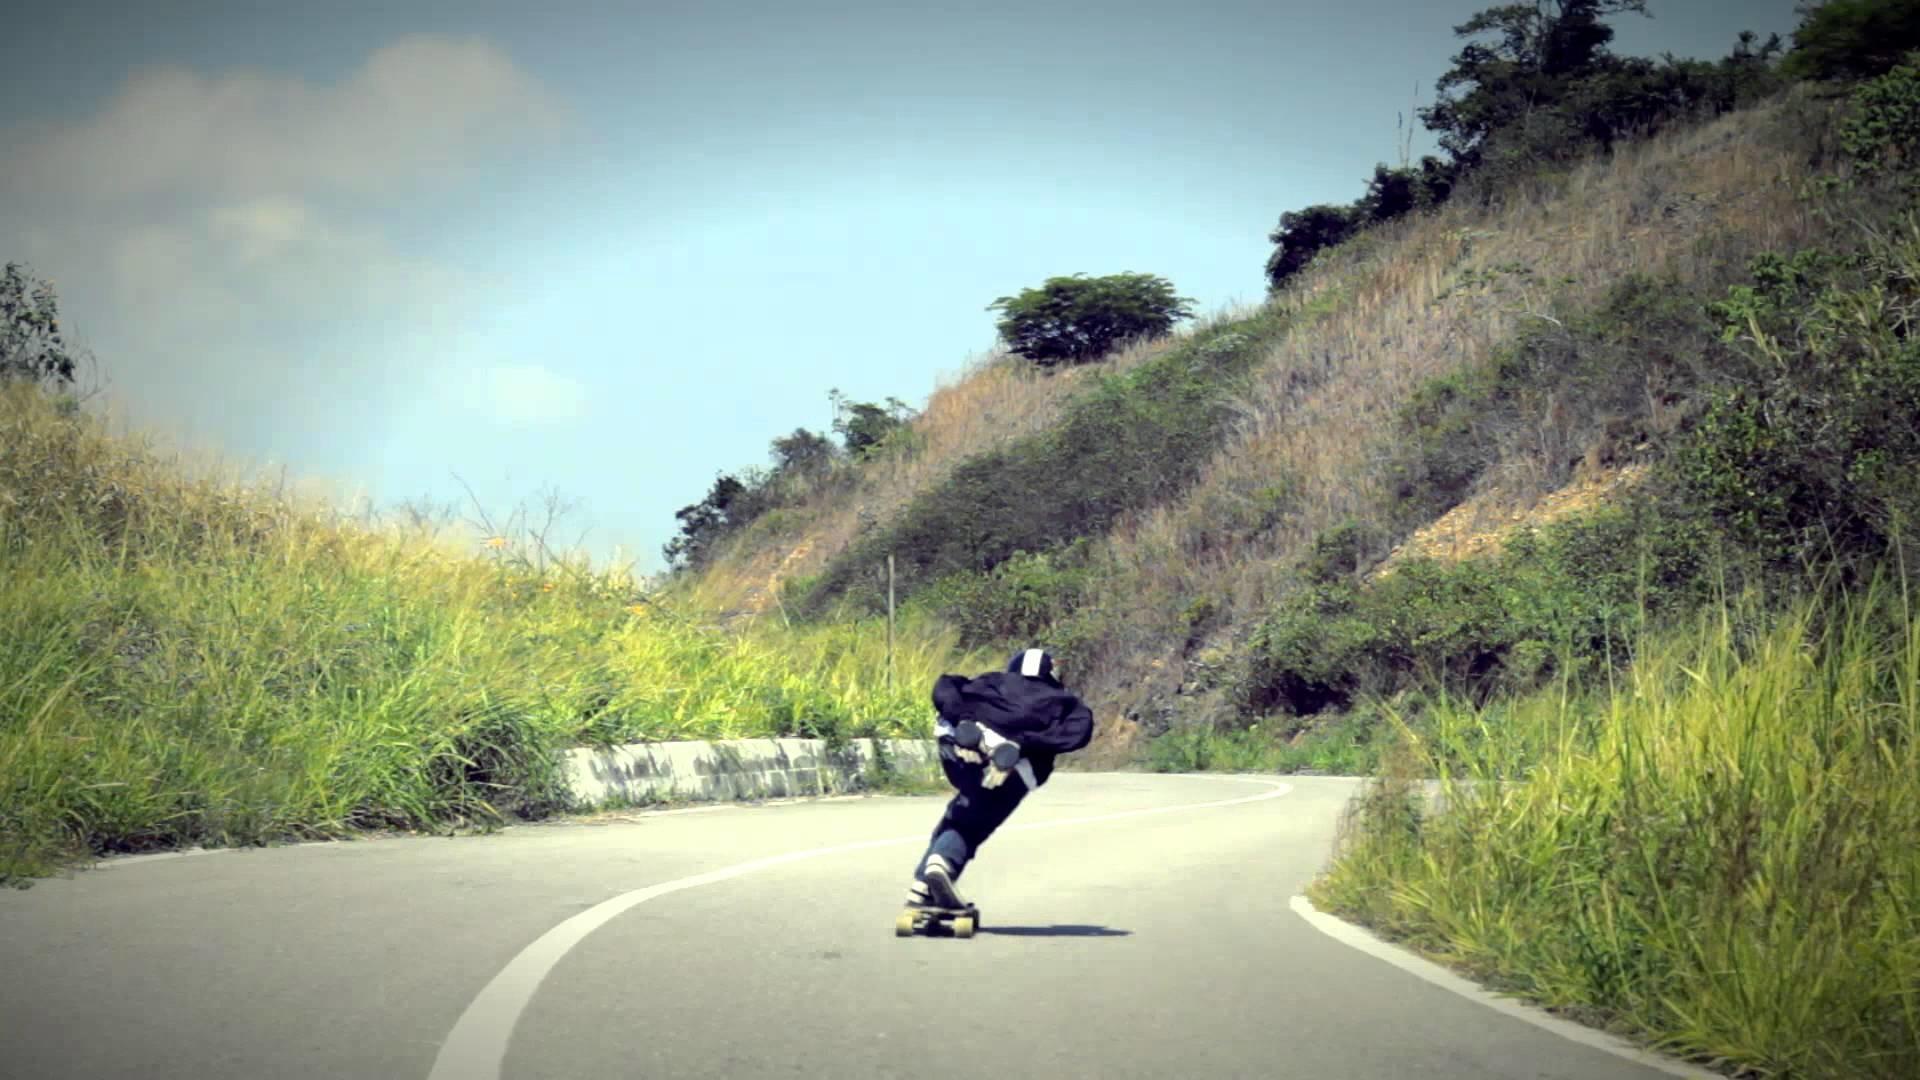 Surfing Girl Iphone Wallpaper Longboard Wallpaper Hd 61 Images